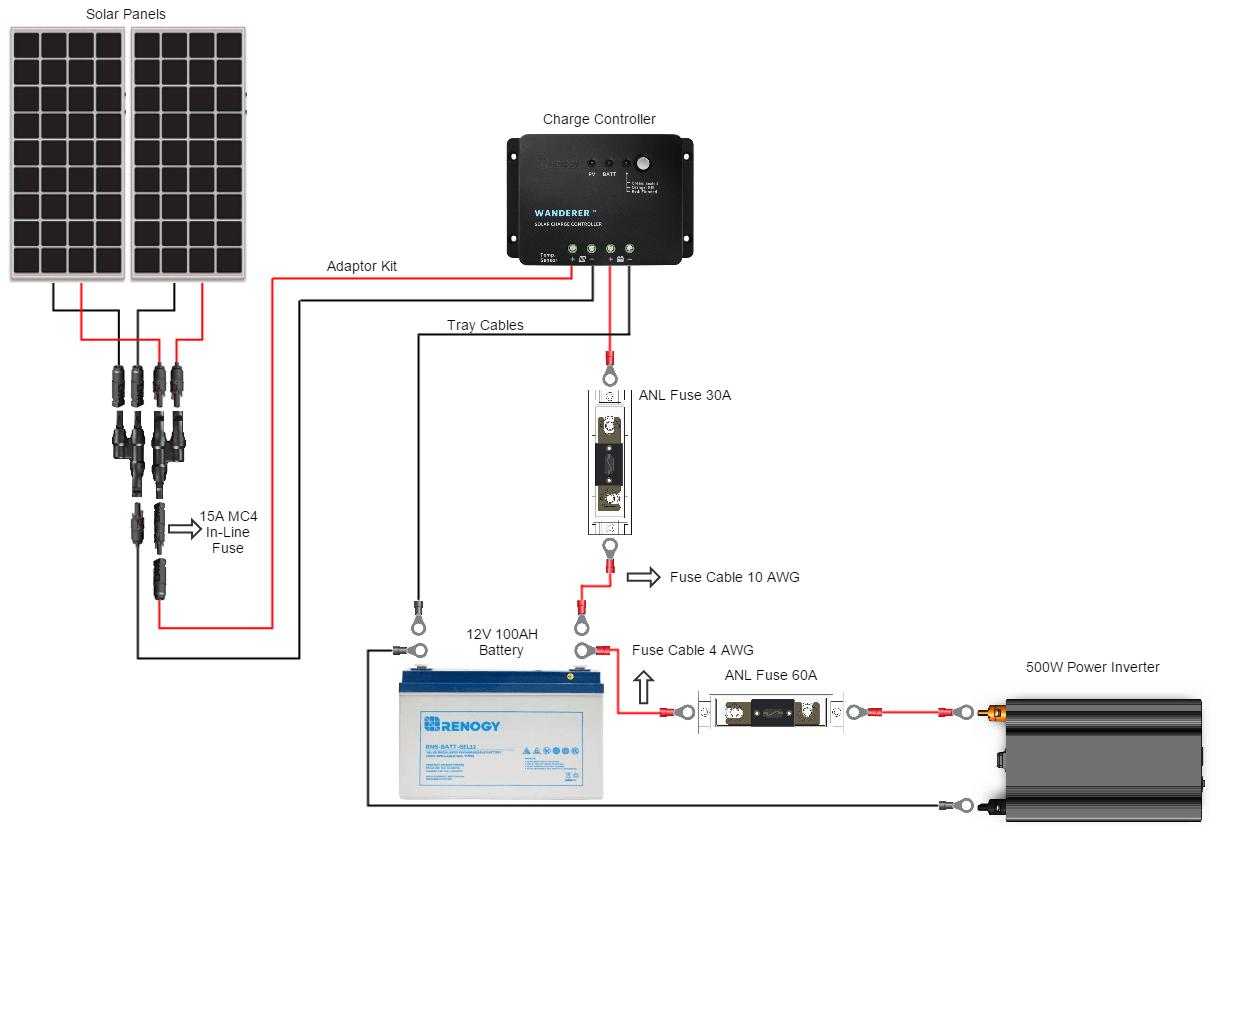 12v solar system wiring diagram yamaha outboard ignition 12 volt renogy pollak trailer plugs